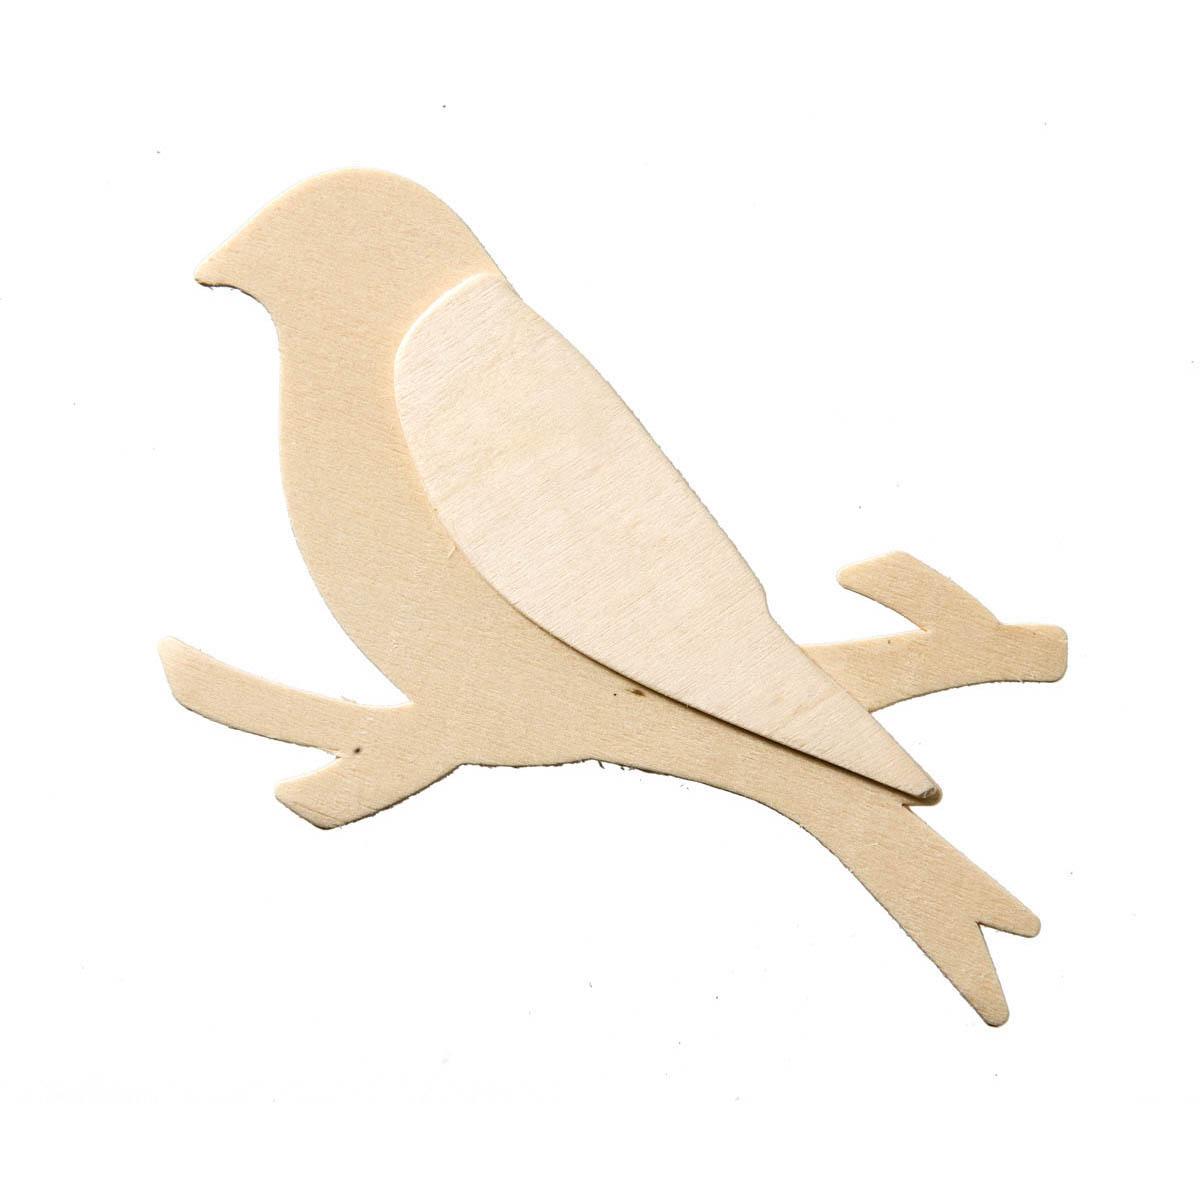 Plaid ® Wood Surfaces - Unpainted Shapes - Bird